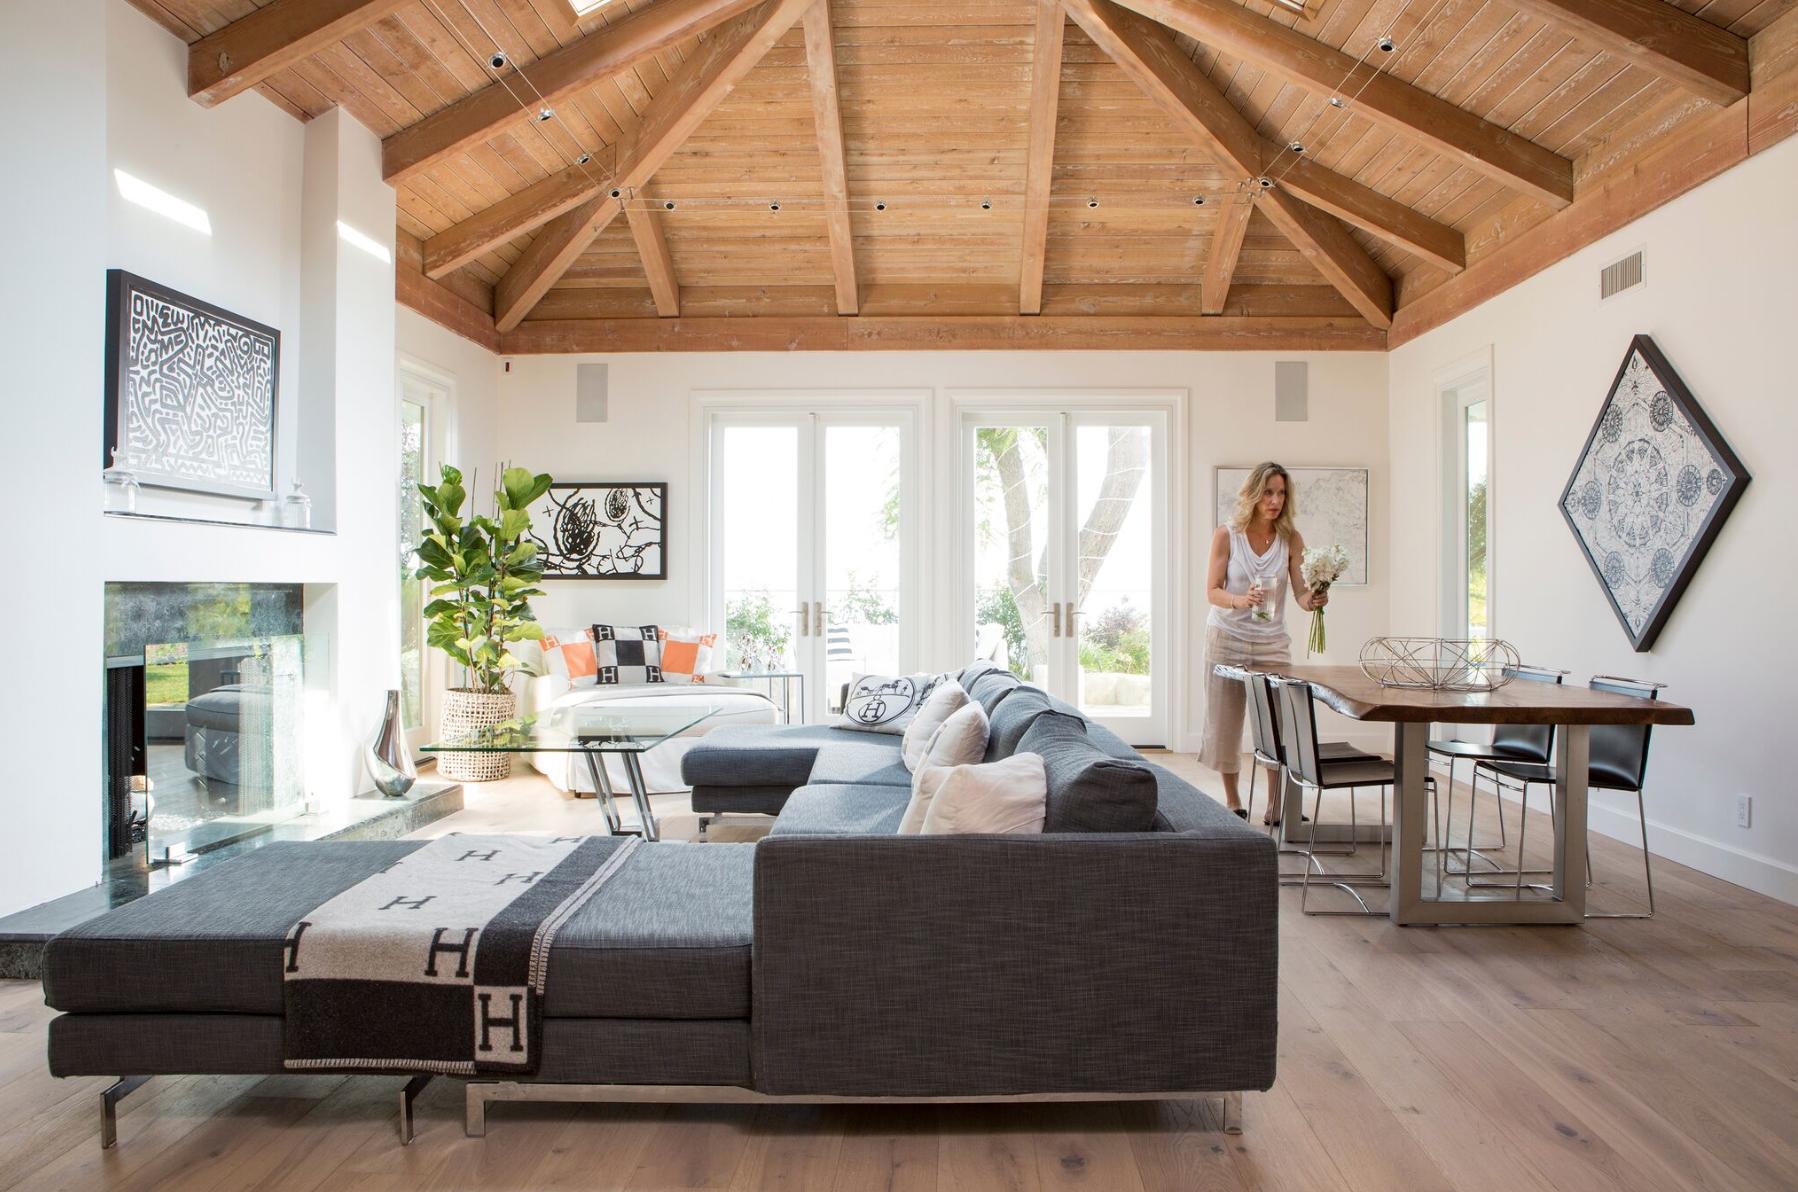 celebrity homes - lori dennis designs lisa chiangs bel air mansion